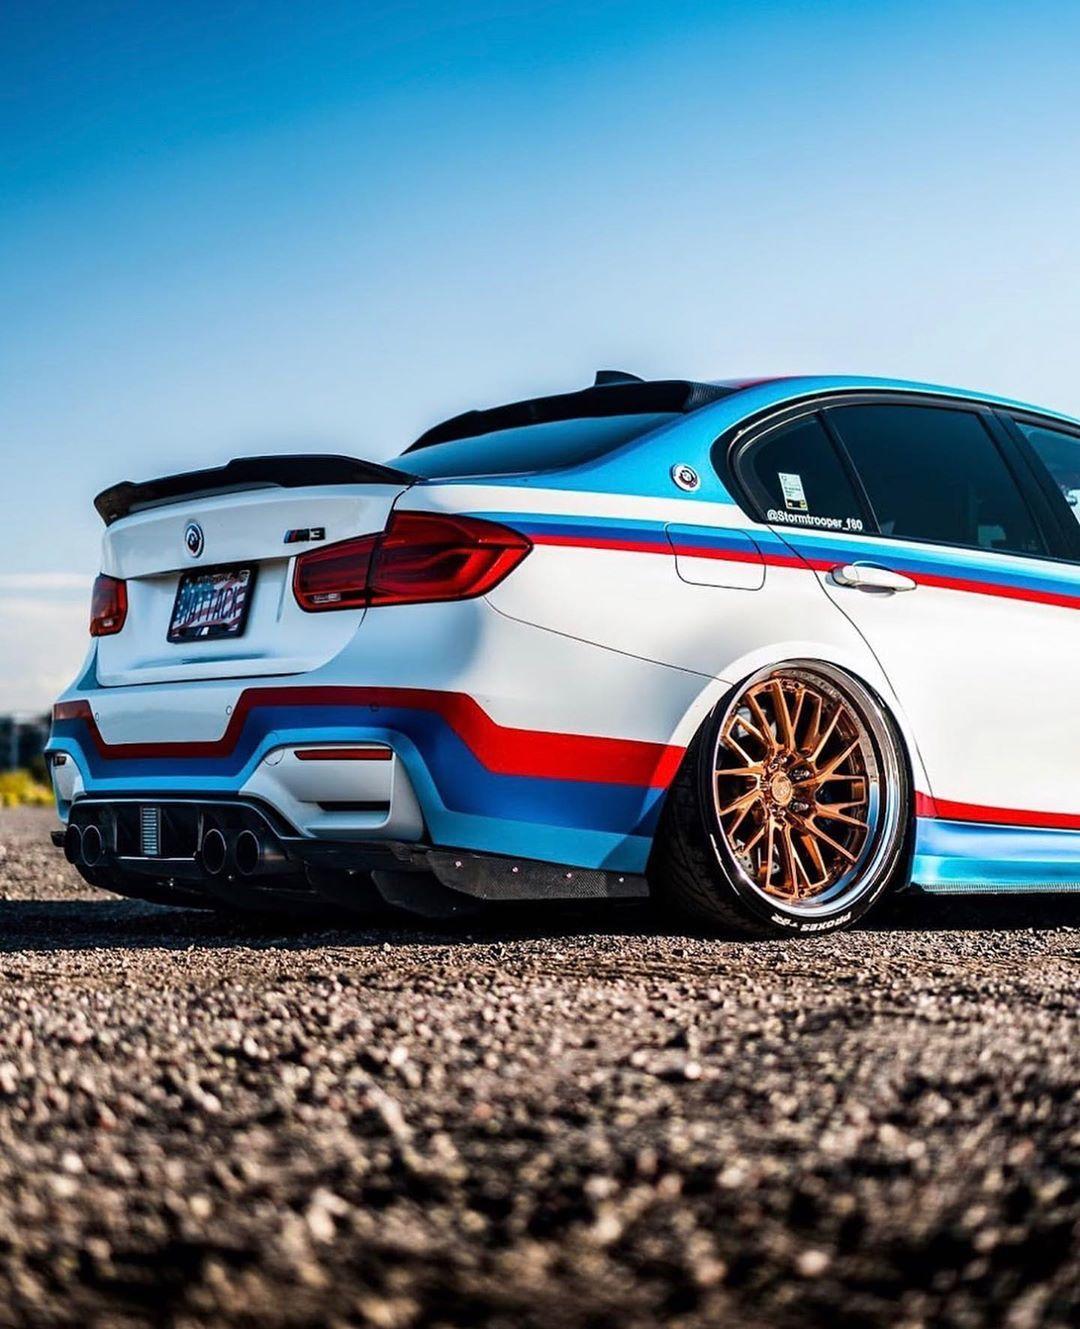 BMW F80 M3 In ///M Livery @stormtrooper_f80